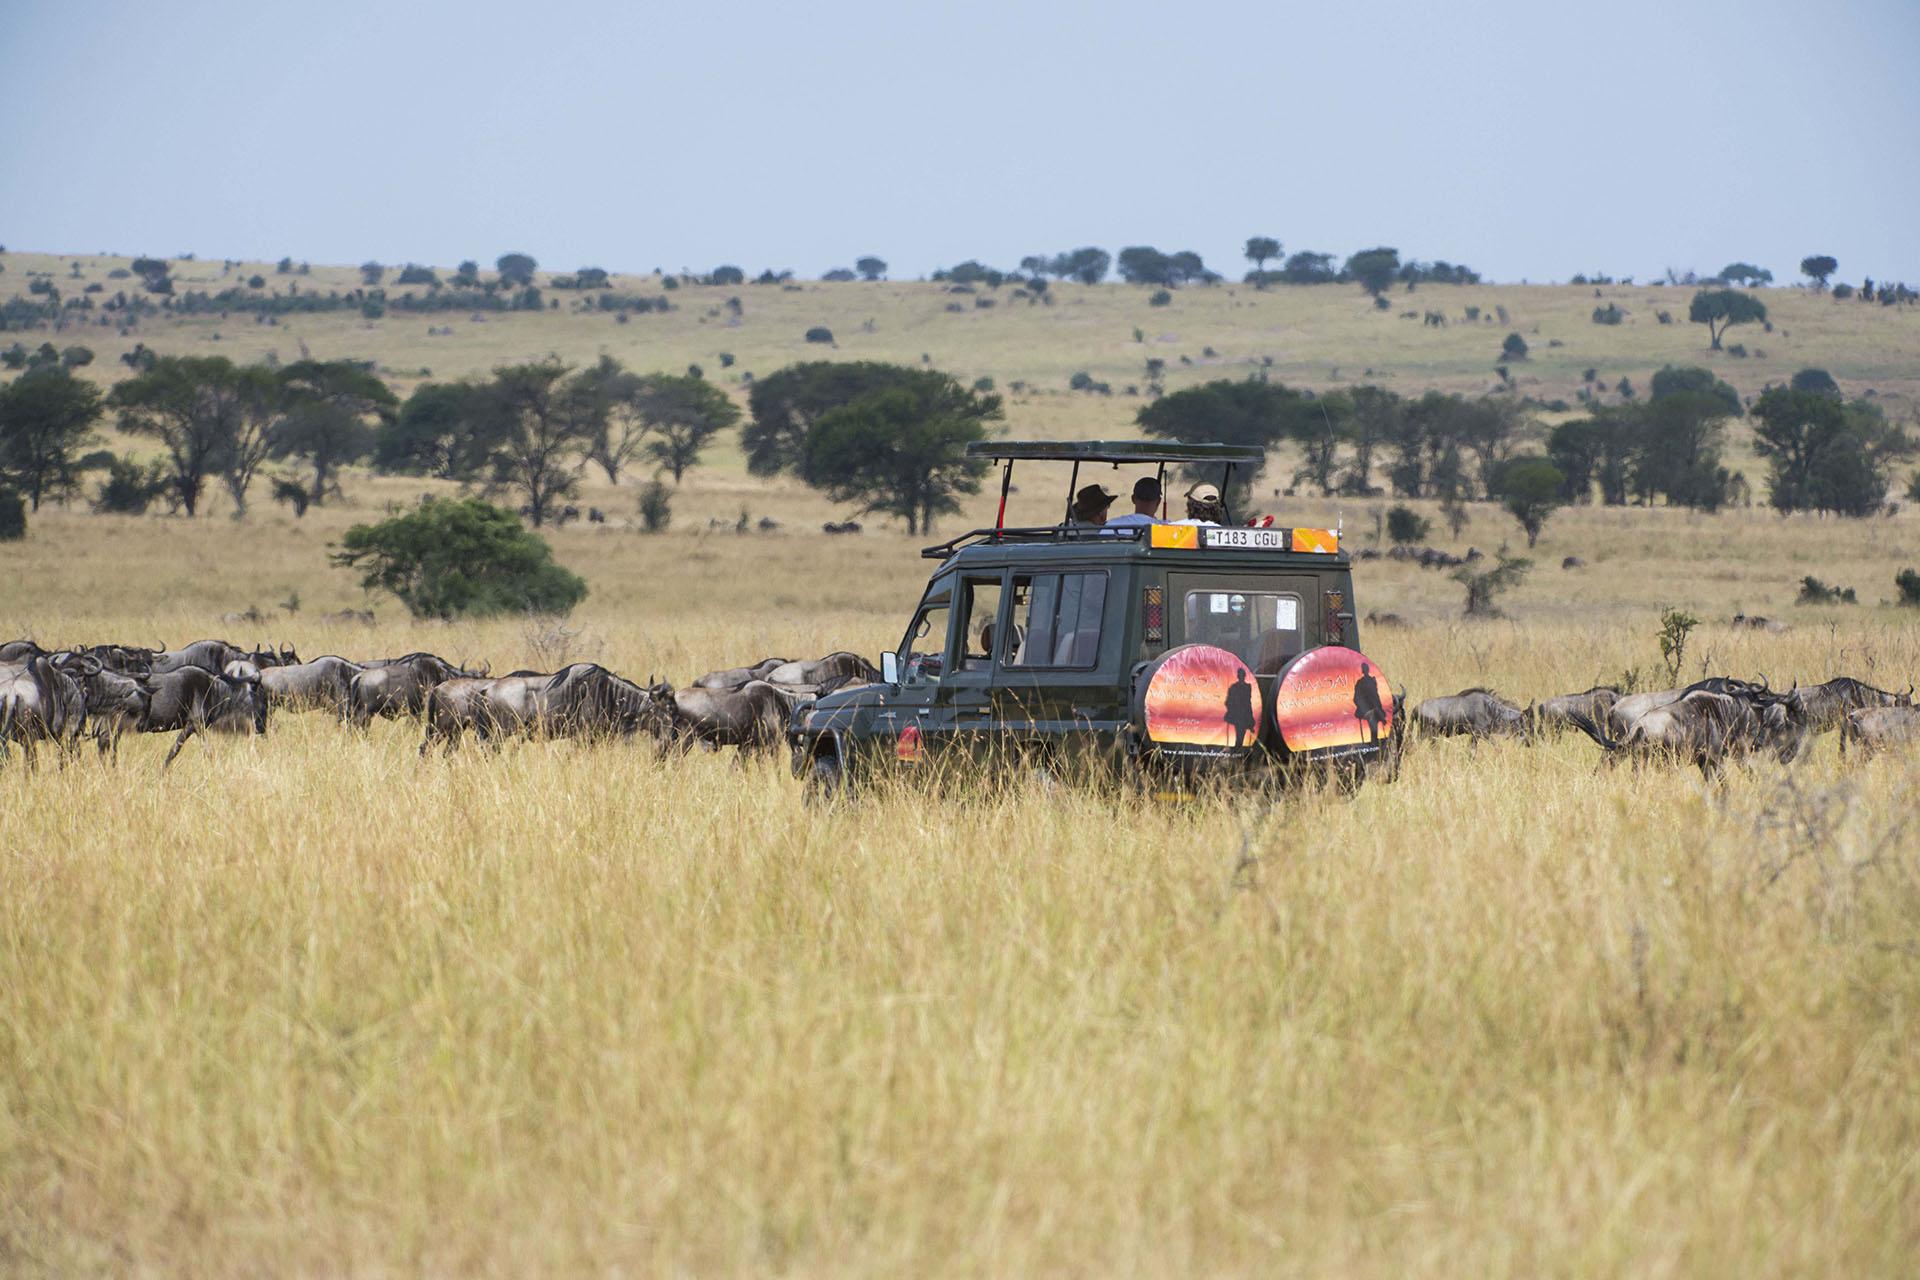 gallery-maasai-wanderings-safari-itineraries-signature-photo-safaris-africa